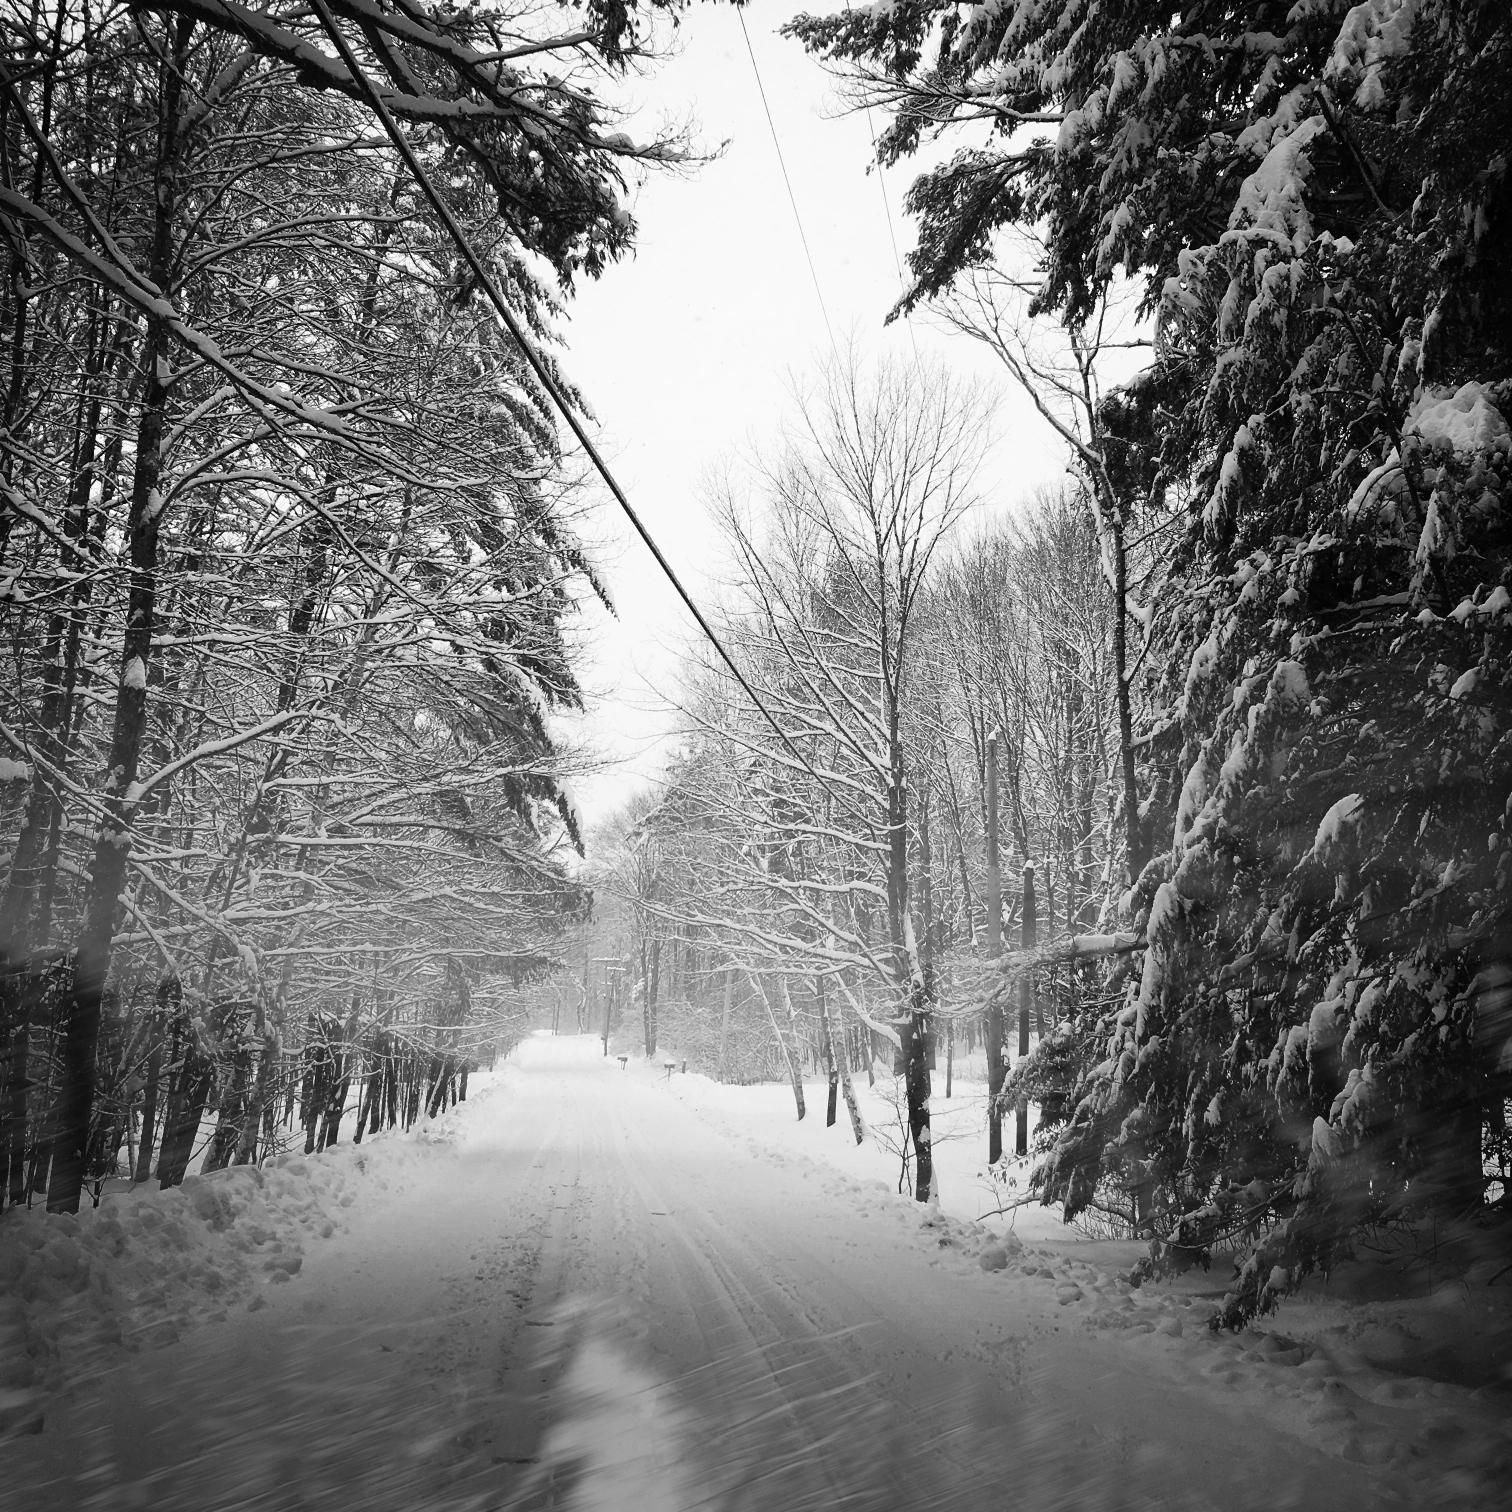 ©Snowy Road by Dena T Bray